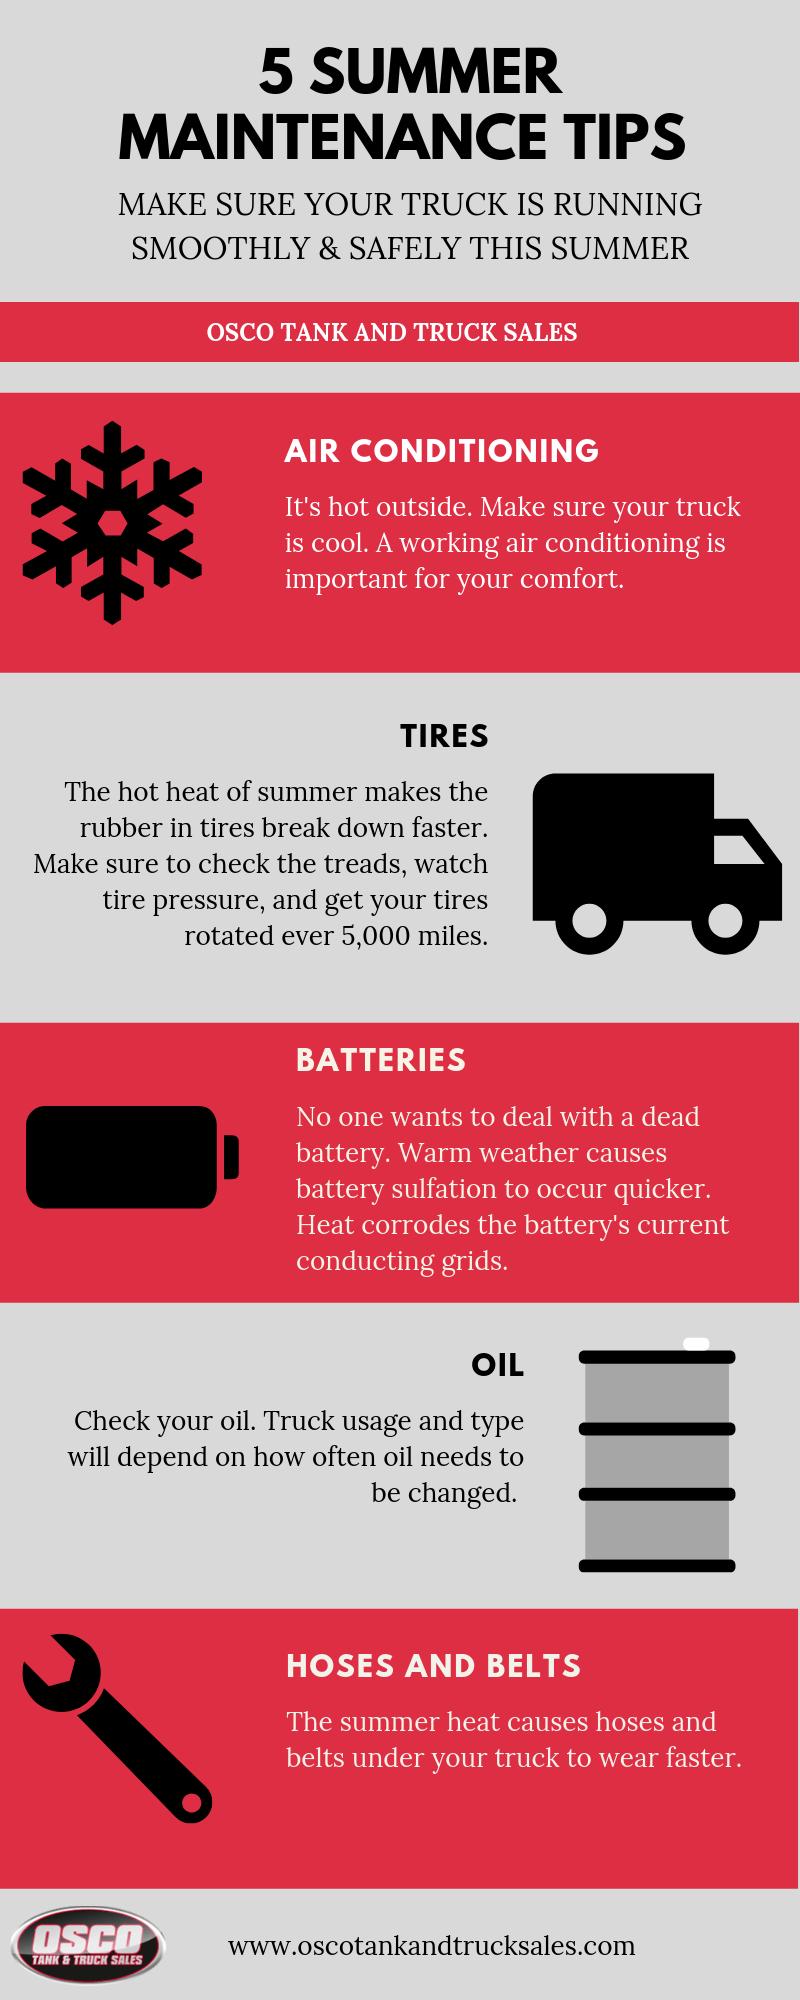 5 Summer Maintenance Tips - Osco Tank & Truck Sales